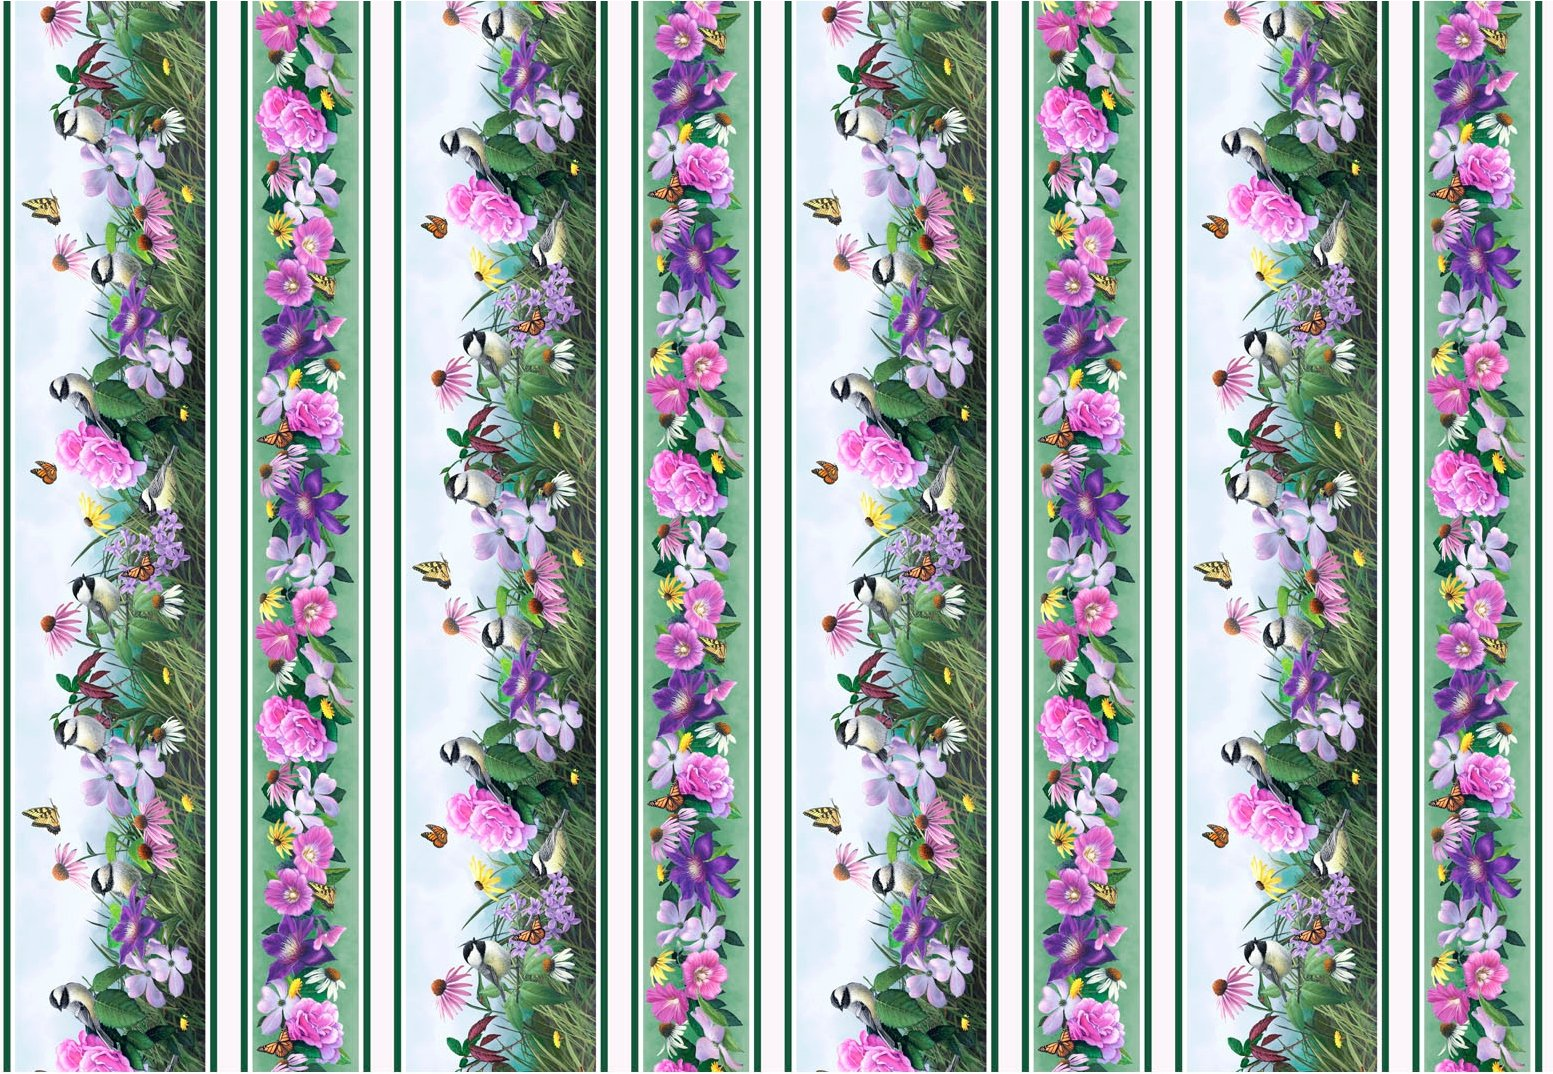 CSON-4494 MU - CHICKADEE SONGS DIGITAL BY LARISA MARTINO STRIPE MULTI - ARRIVING IN AUGUST 2021